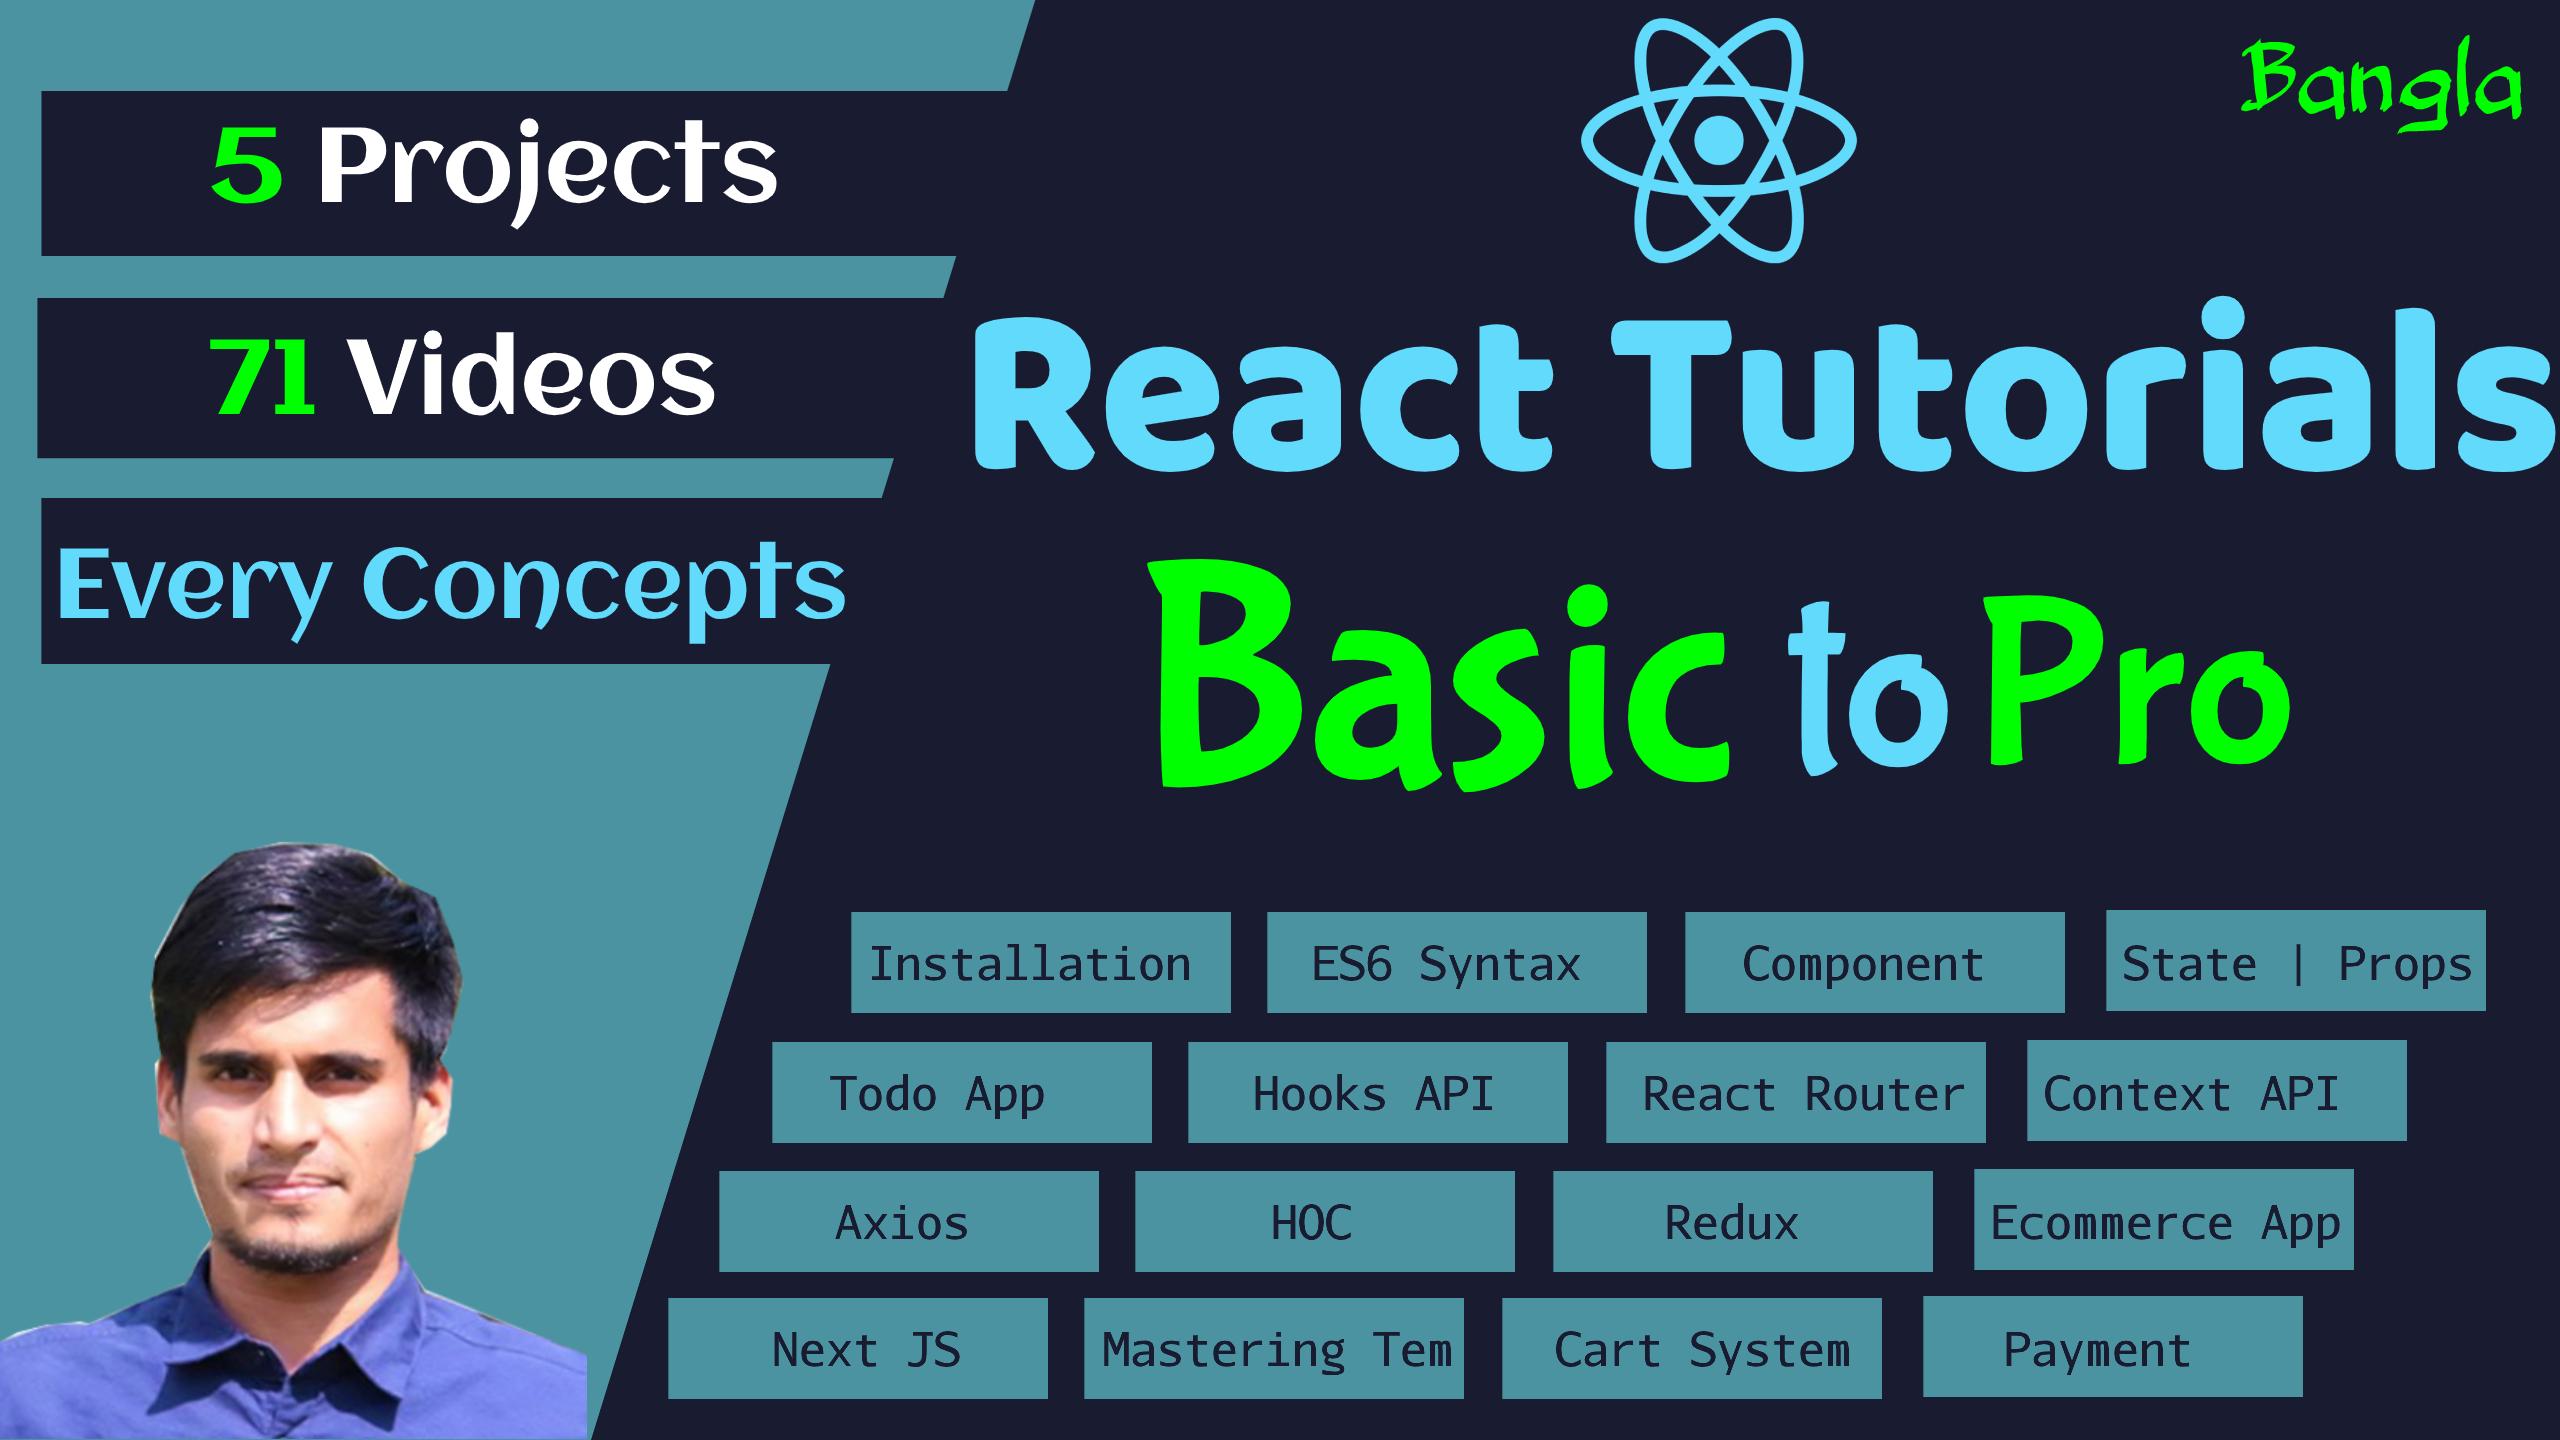 React Tutorials - Beginner to Pro - A Complete React Tutorial Series